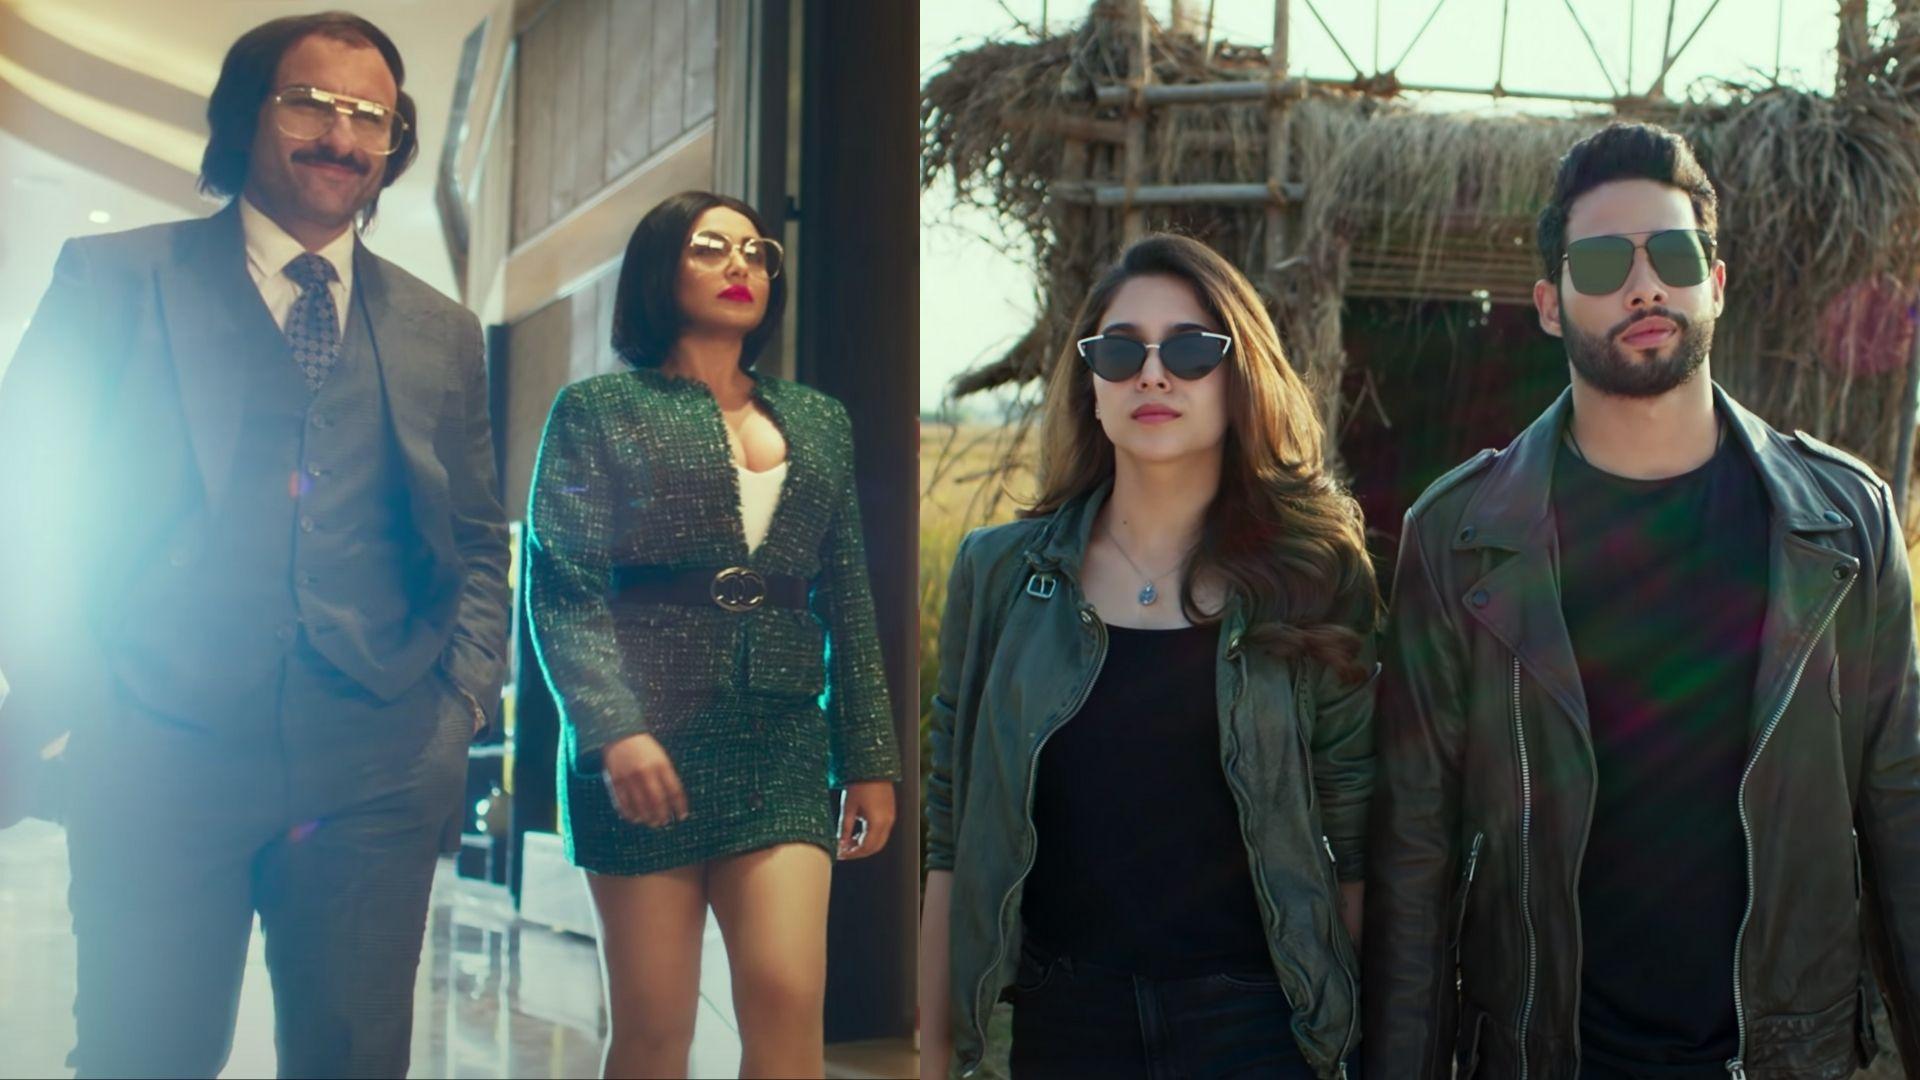 Bunty Aur Babli 2 Trailer: Saif Ali Khan, Rani Mukerji, Siddhant Chaturvedi, Sharvari Will Make You Go ROFL; BIG Surprise Element Can't Be Missed